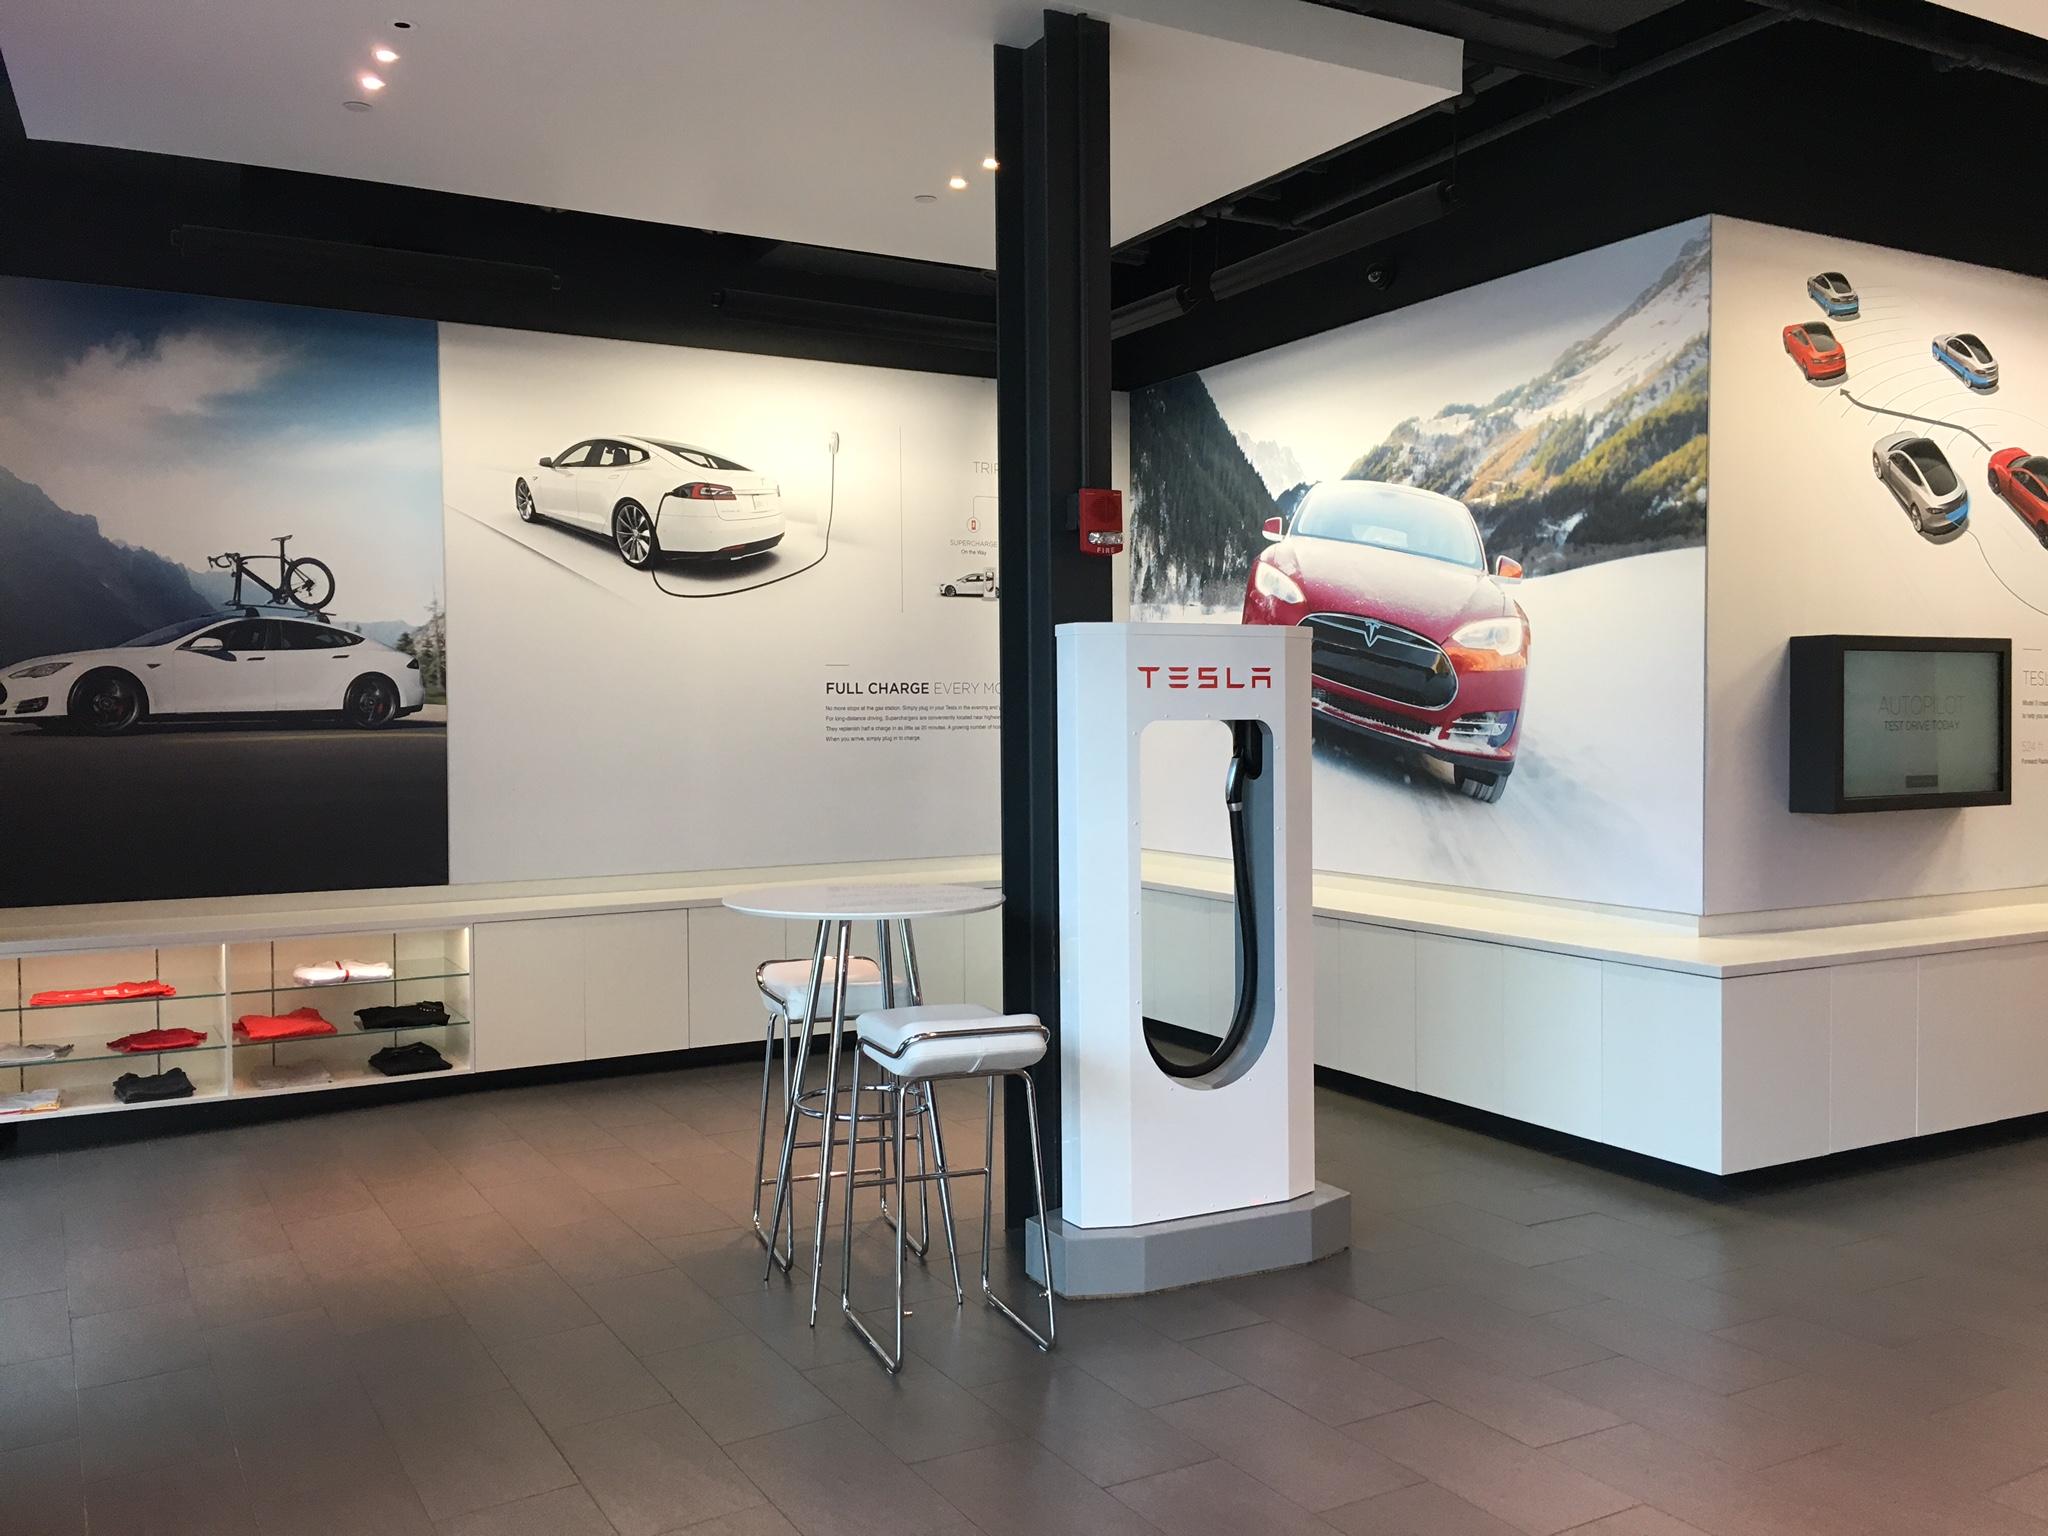 SEG Tension Fabric Signage SEG silicone edge graphics printing signage Tesla car dealership